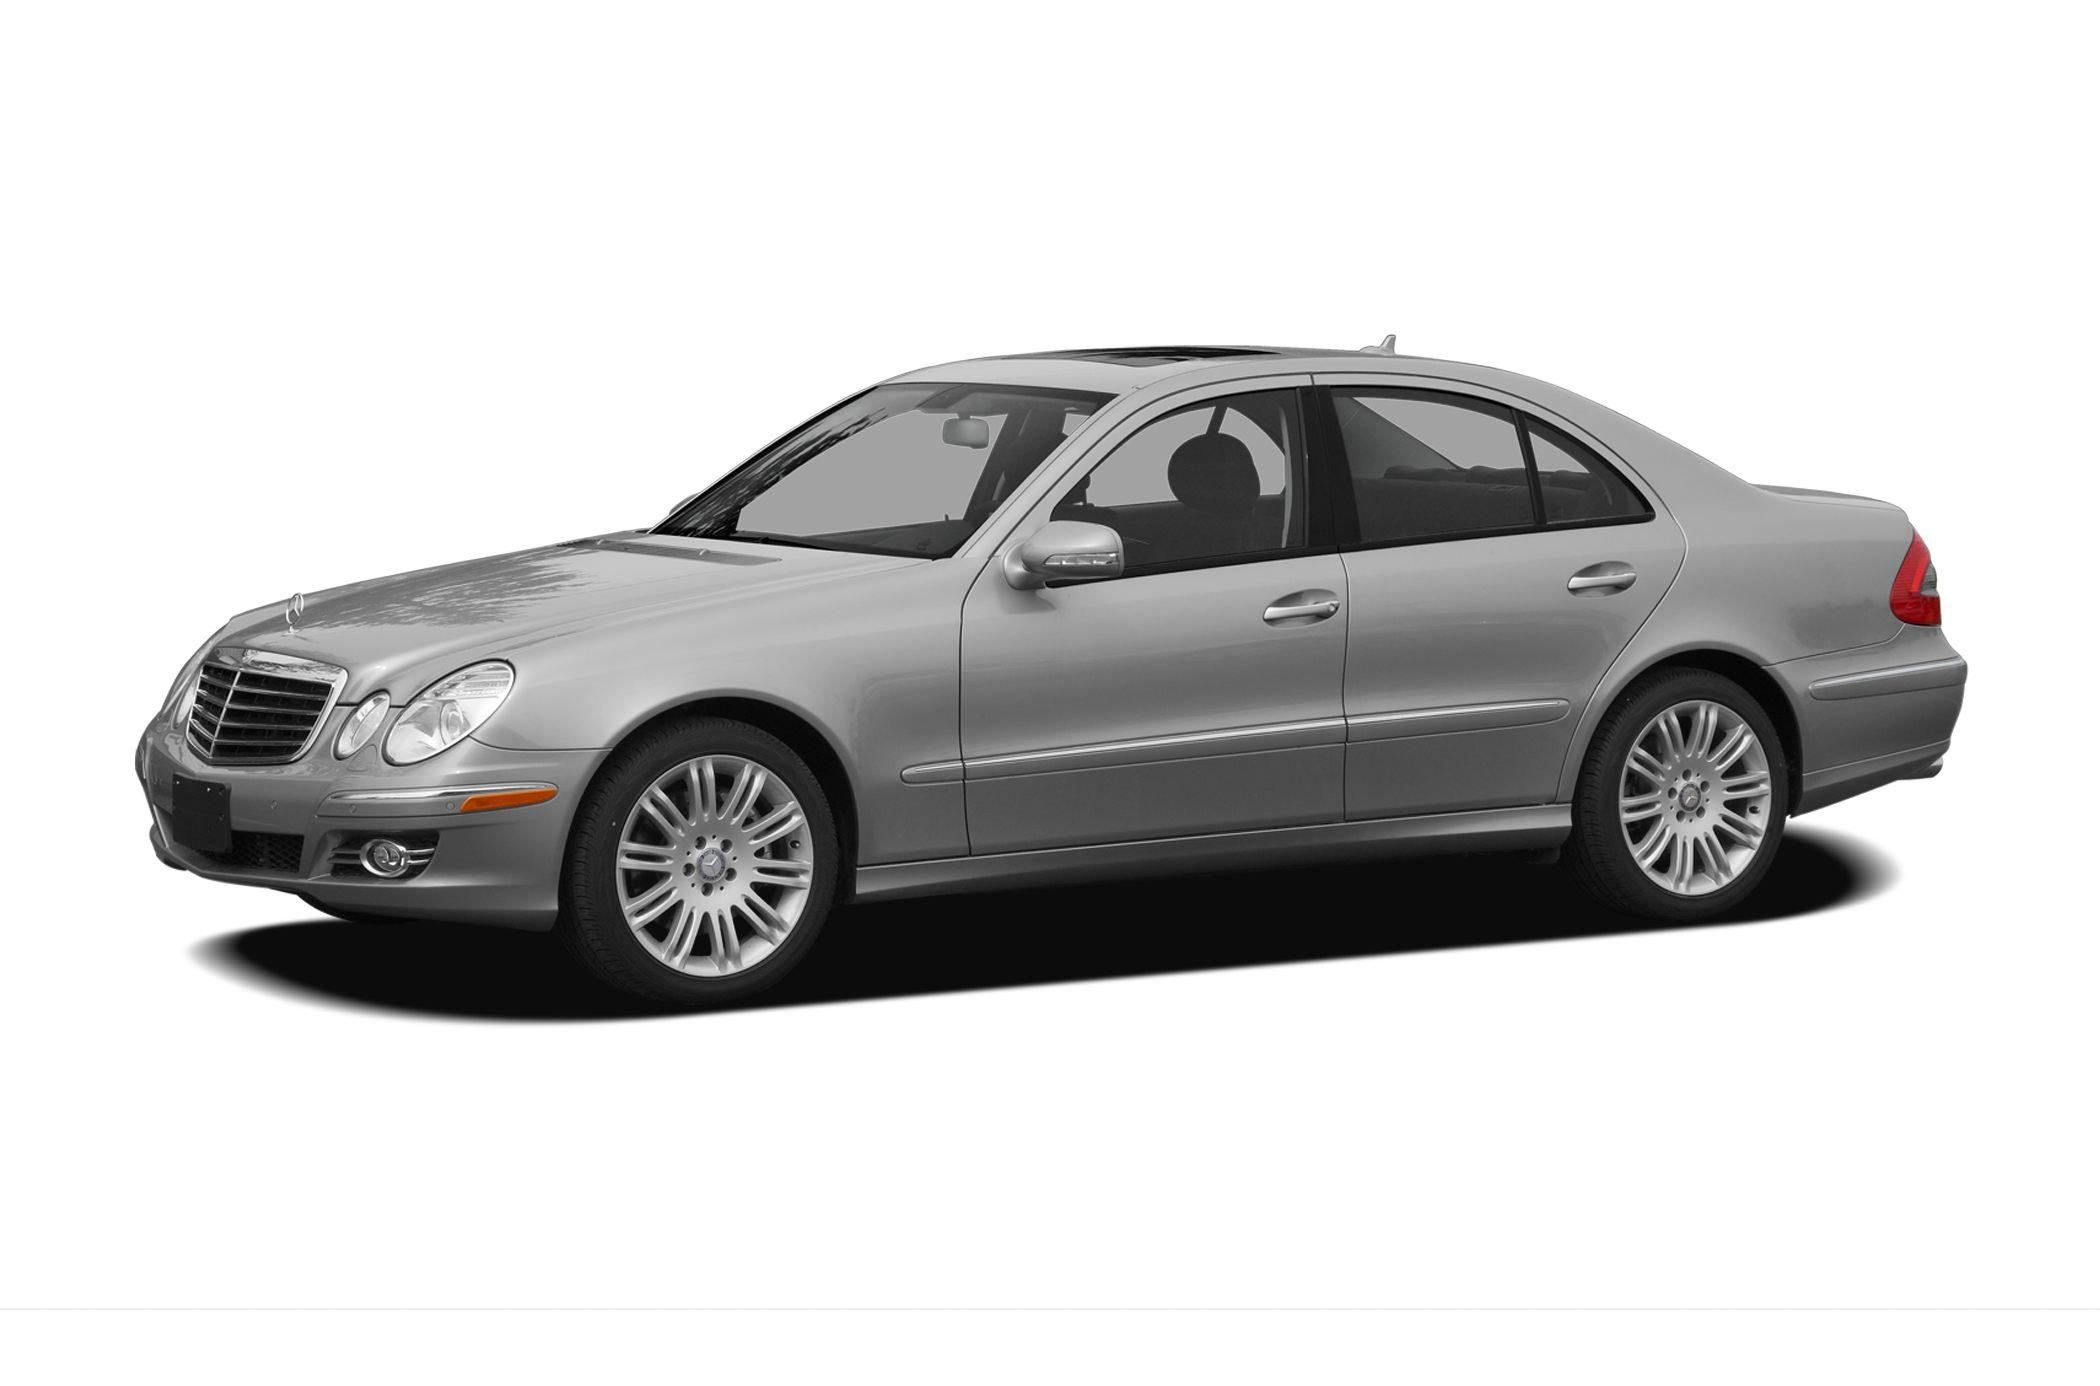 2007 Mercedes-Benz E-Class E350 Sedan for sale in Tulsa for $22,000 with 75,310 miles.